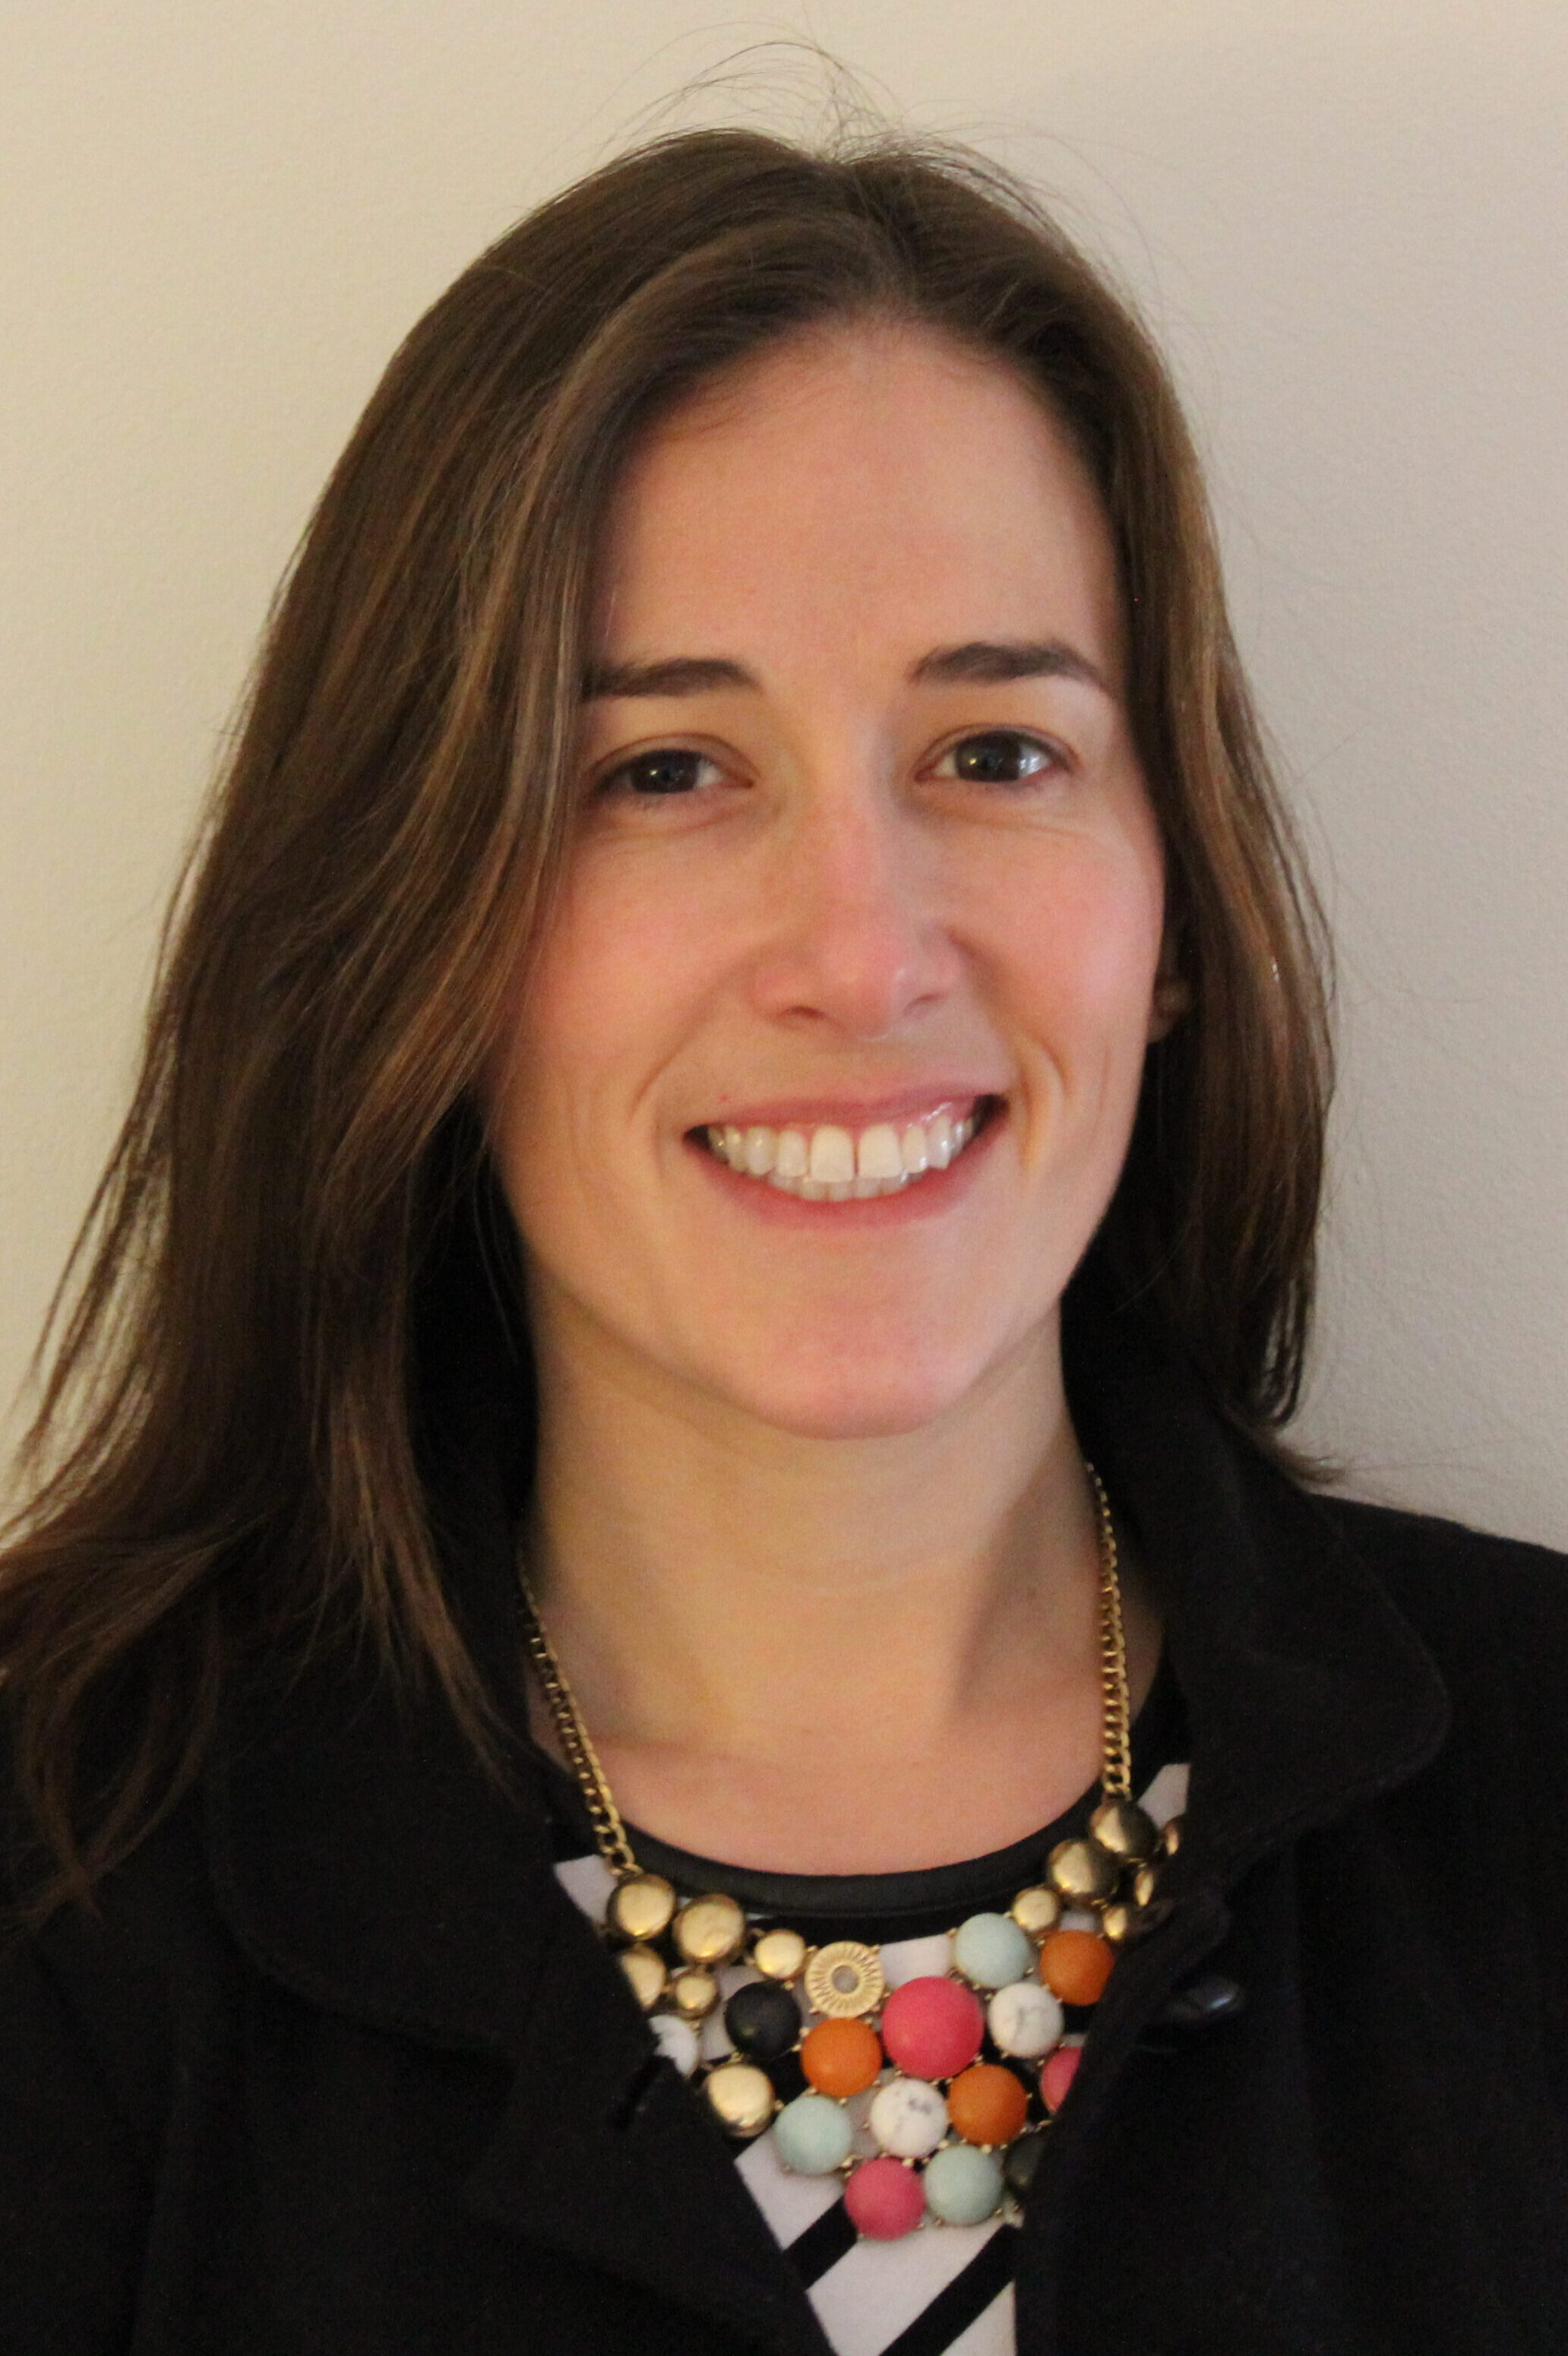 Kelly Thoerig (Moderator)